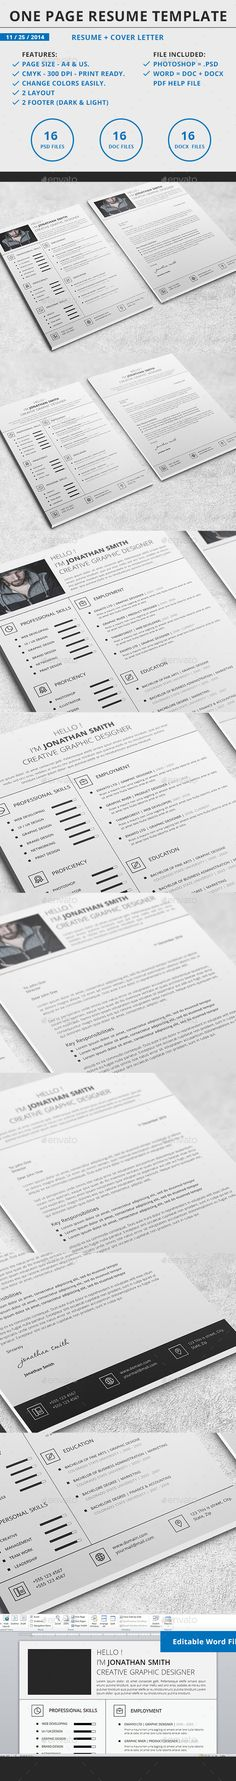 Resume Template Pinterest Template, Creative resume templates